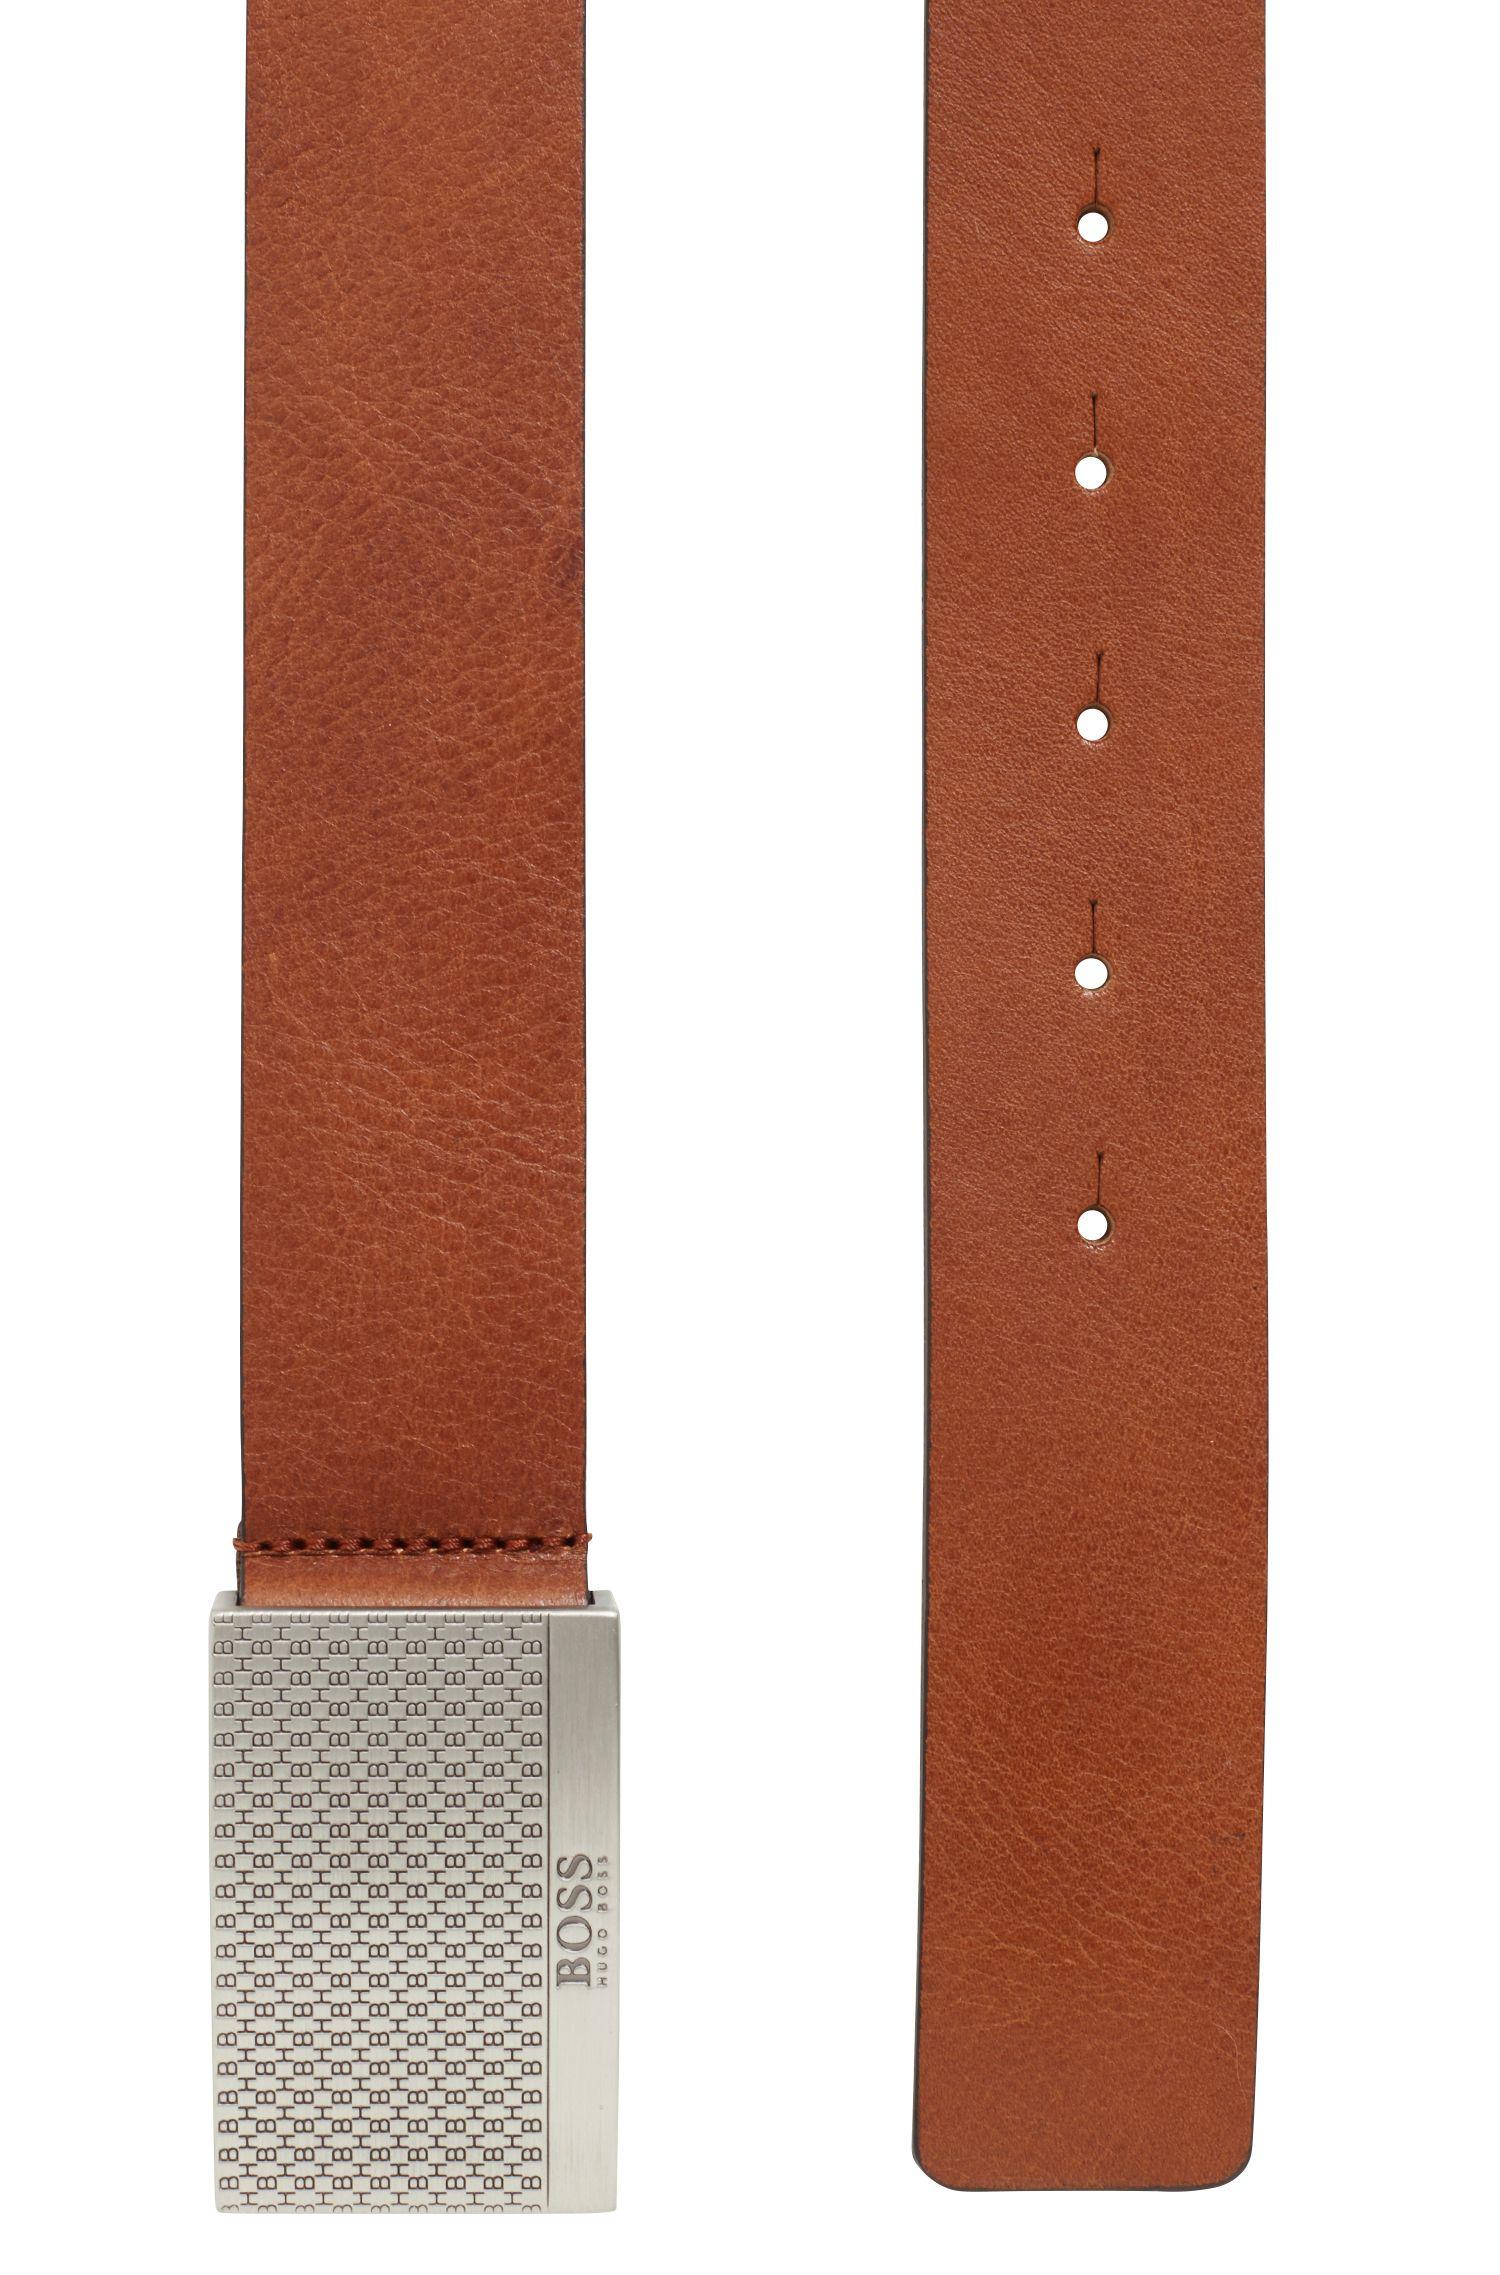 Hugo Boss - Ledergürtel mit Koppelschließe im Monogramm-Design - 3